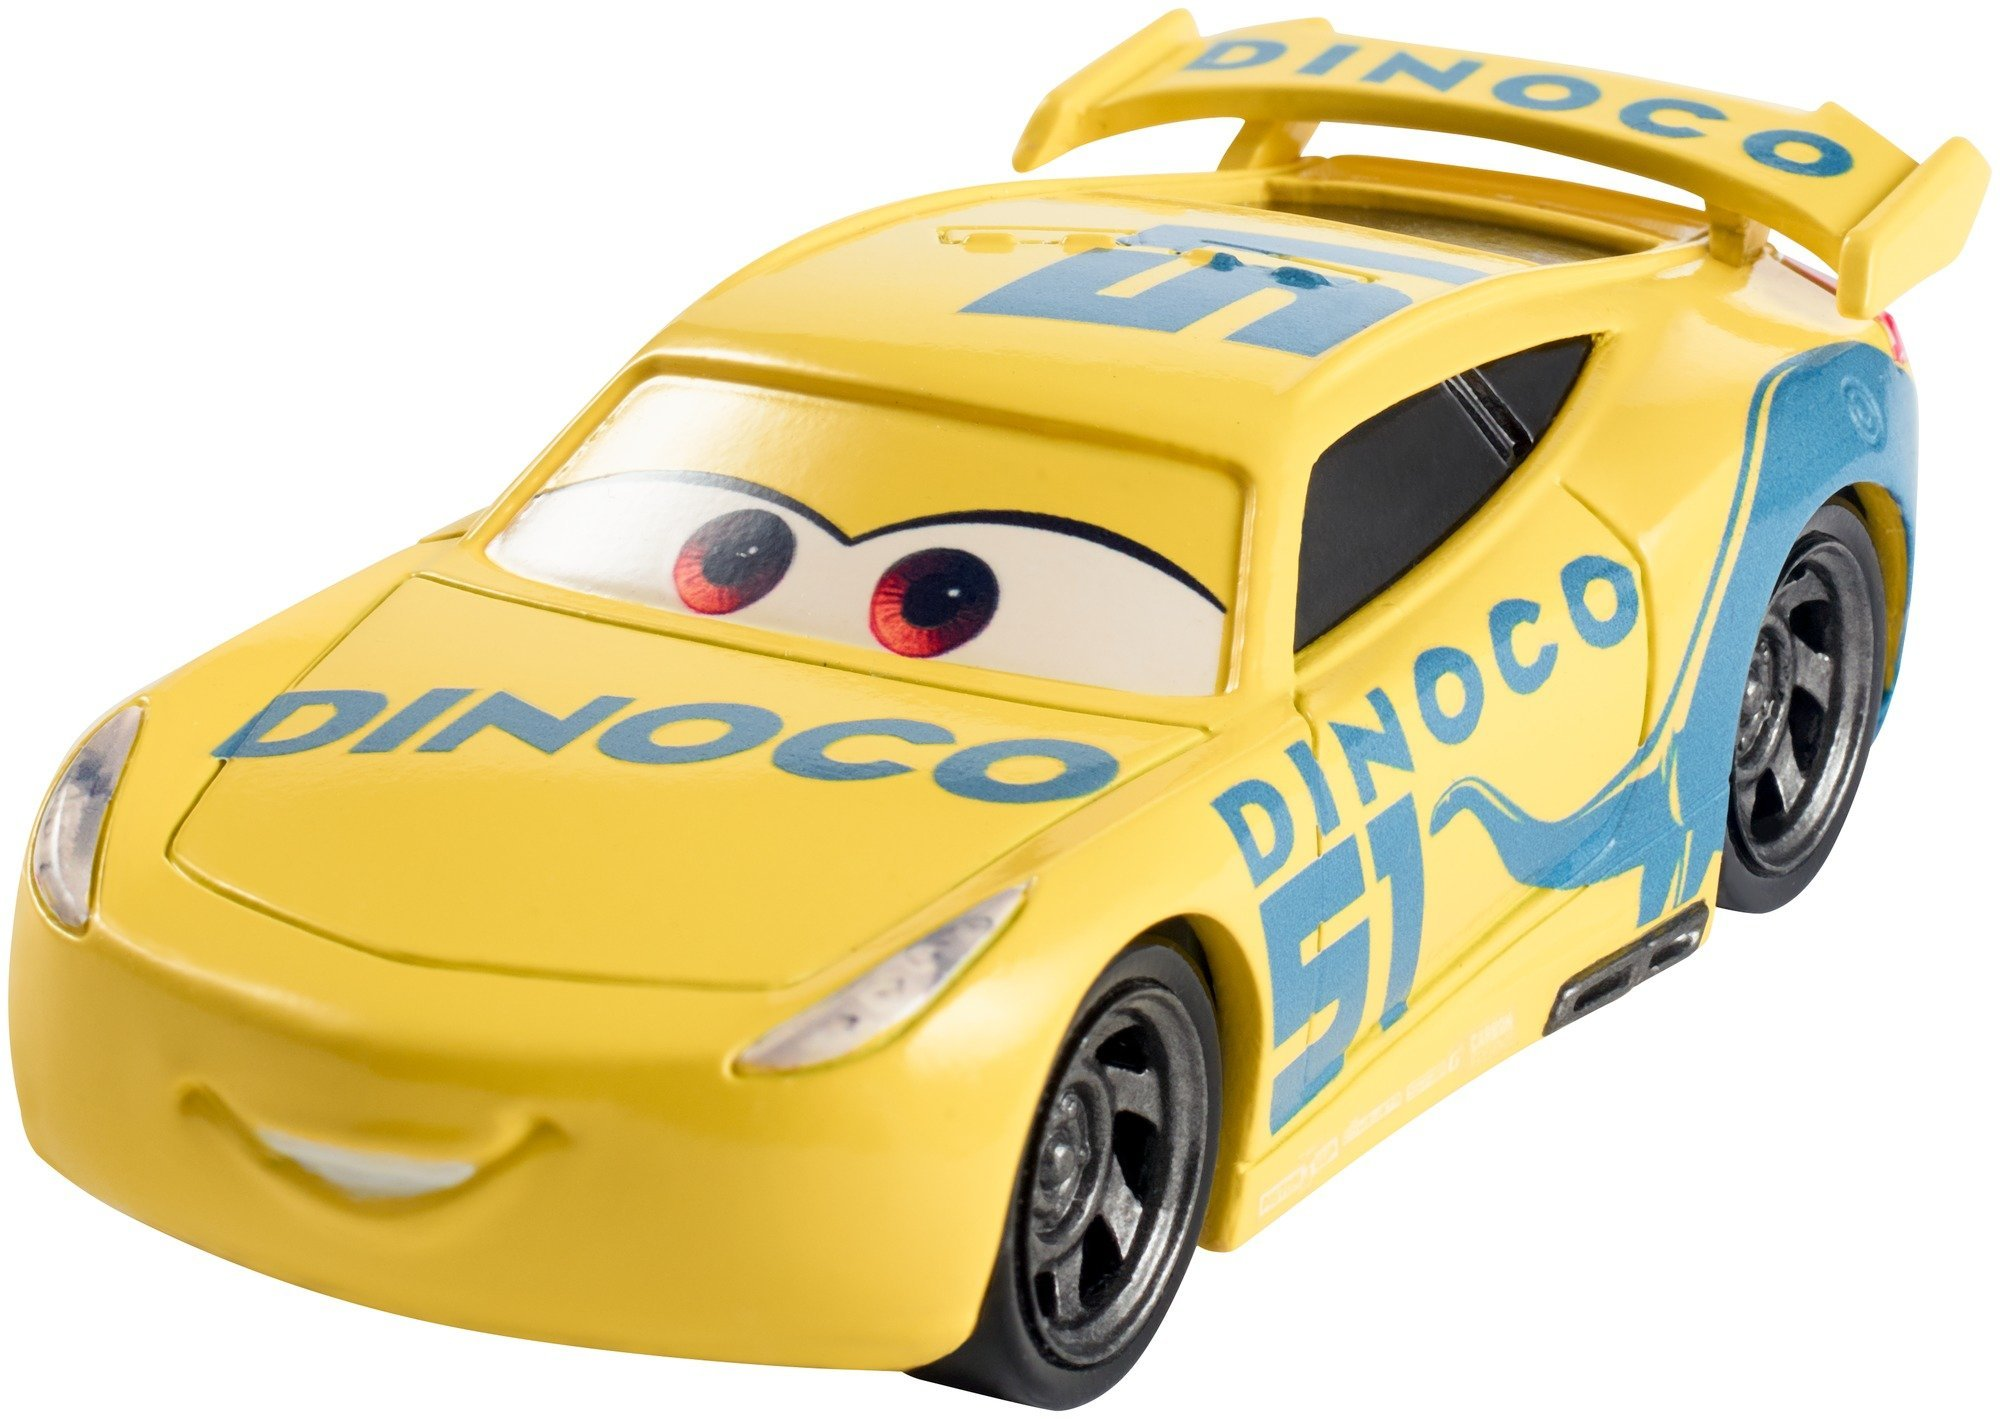 Disney DXV71 Pixar Cars 3 Dinoco Cruz Ramirez Die-Cast Vehicle [Old Model]